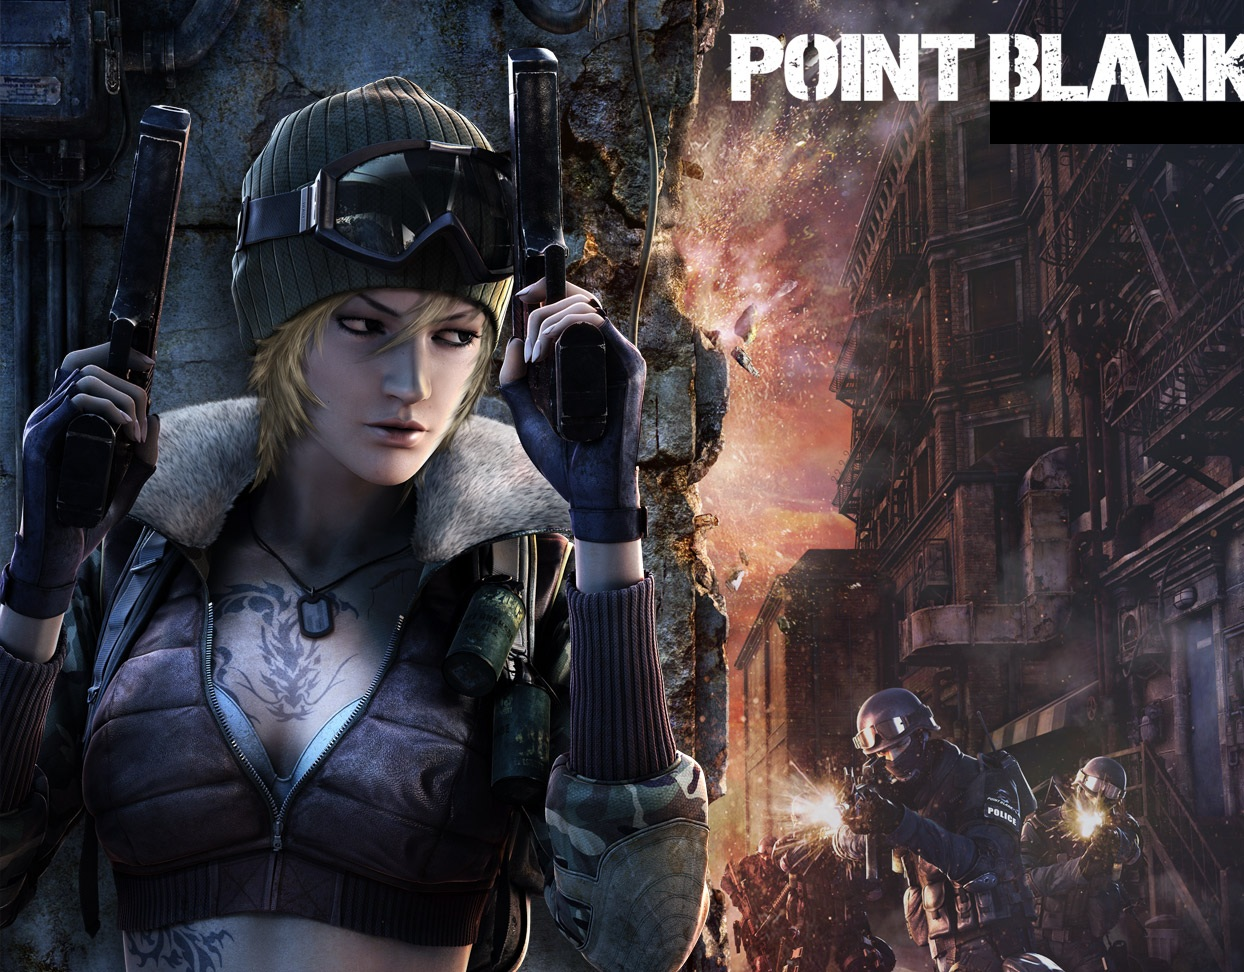 Point Blank Wallhack Hotkey Güncel Oyun Hile botu indir 2012